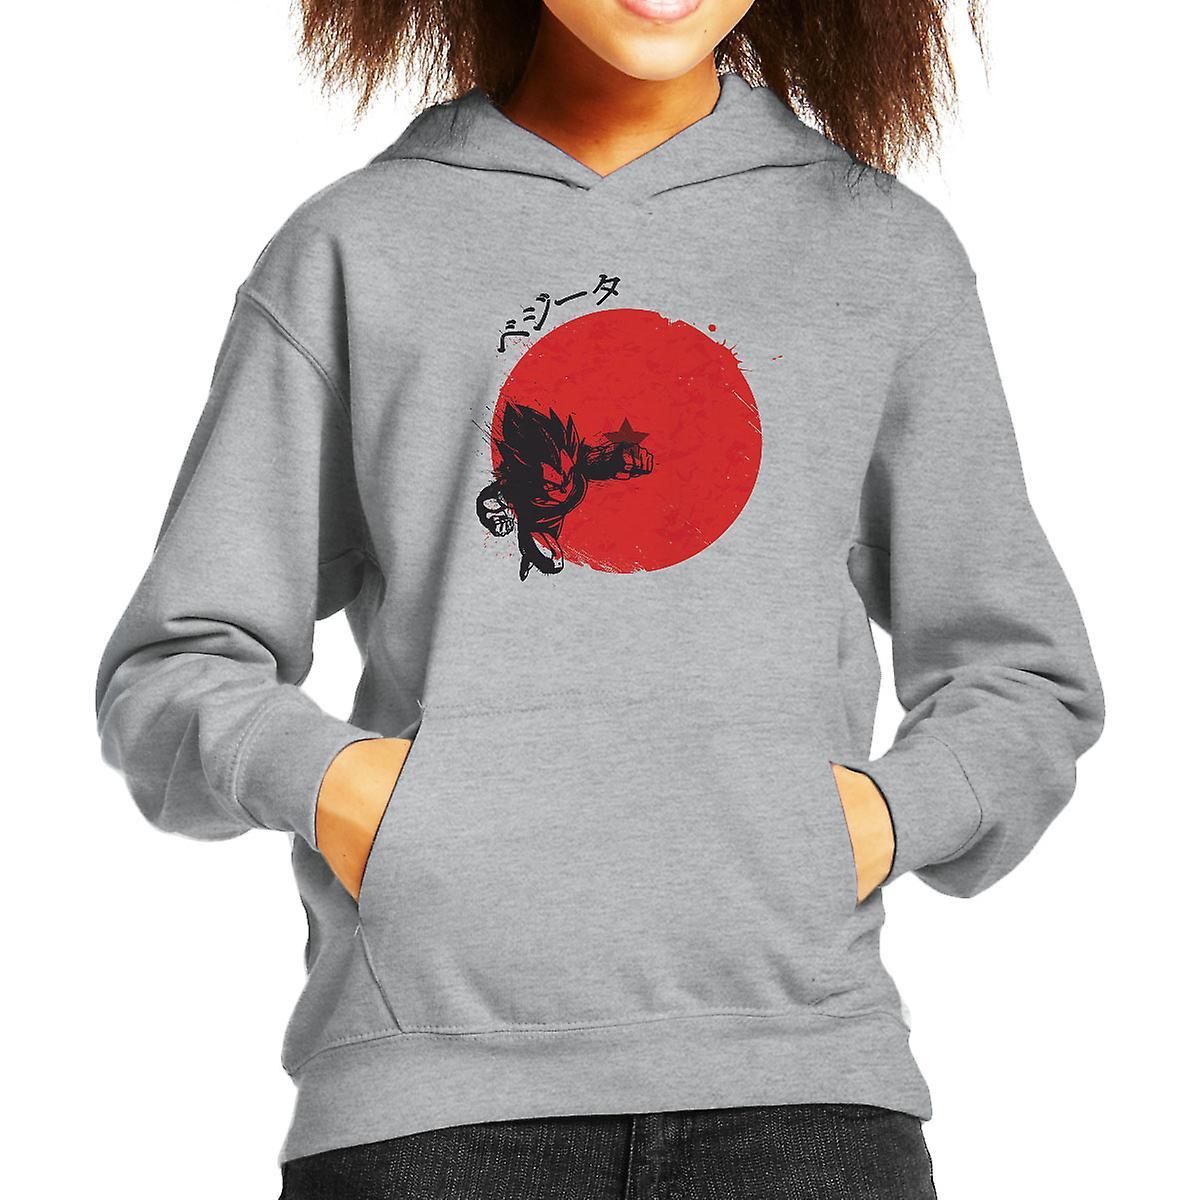 Rote Sonne Vegeta Dragonball Z Kinder Sweatshirt mit Kapuze   Fruugo 8689c18b5e